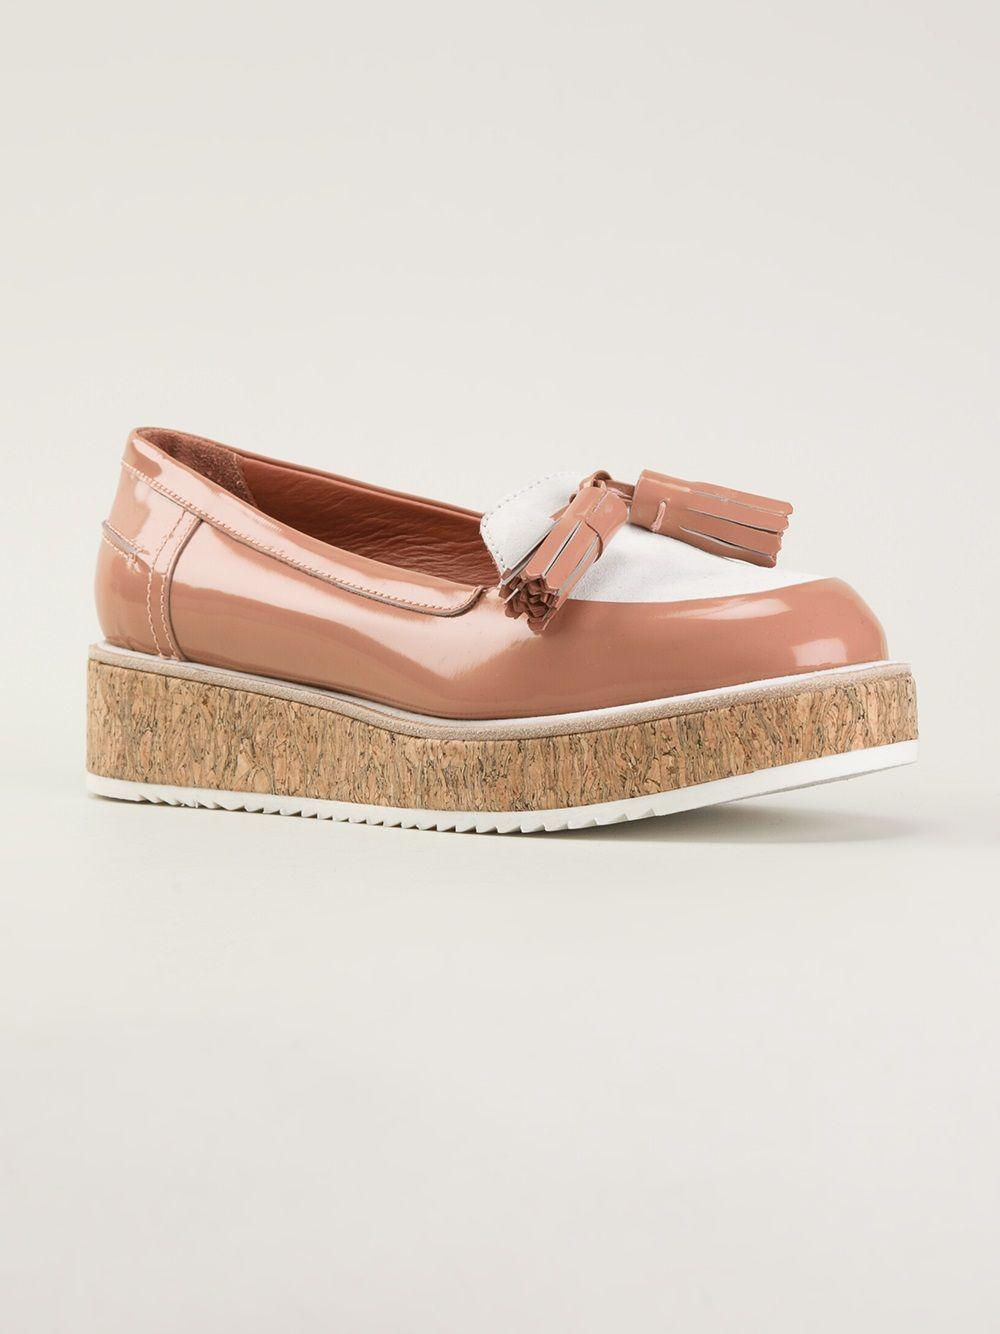 c69b37debf64 Sonia Rykiel  Platform  Loafers